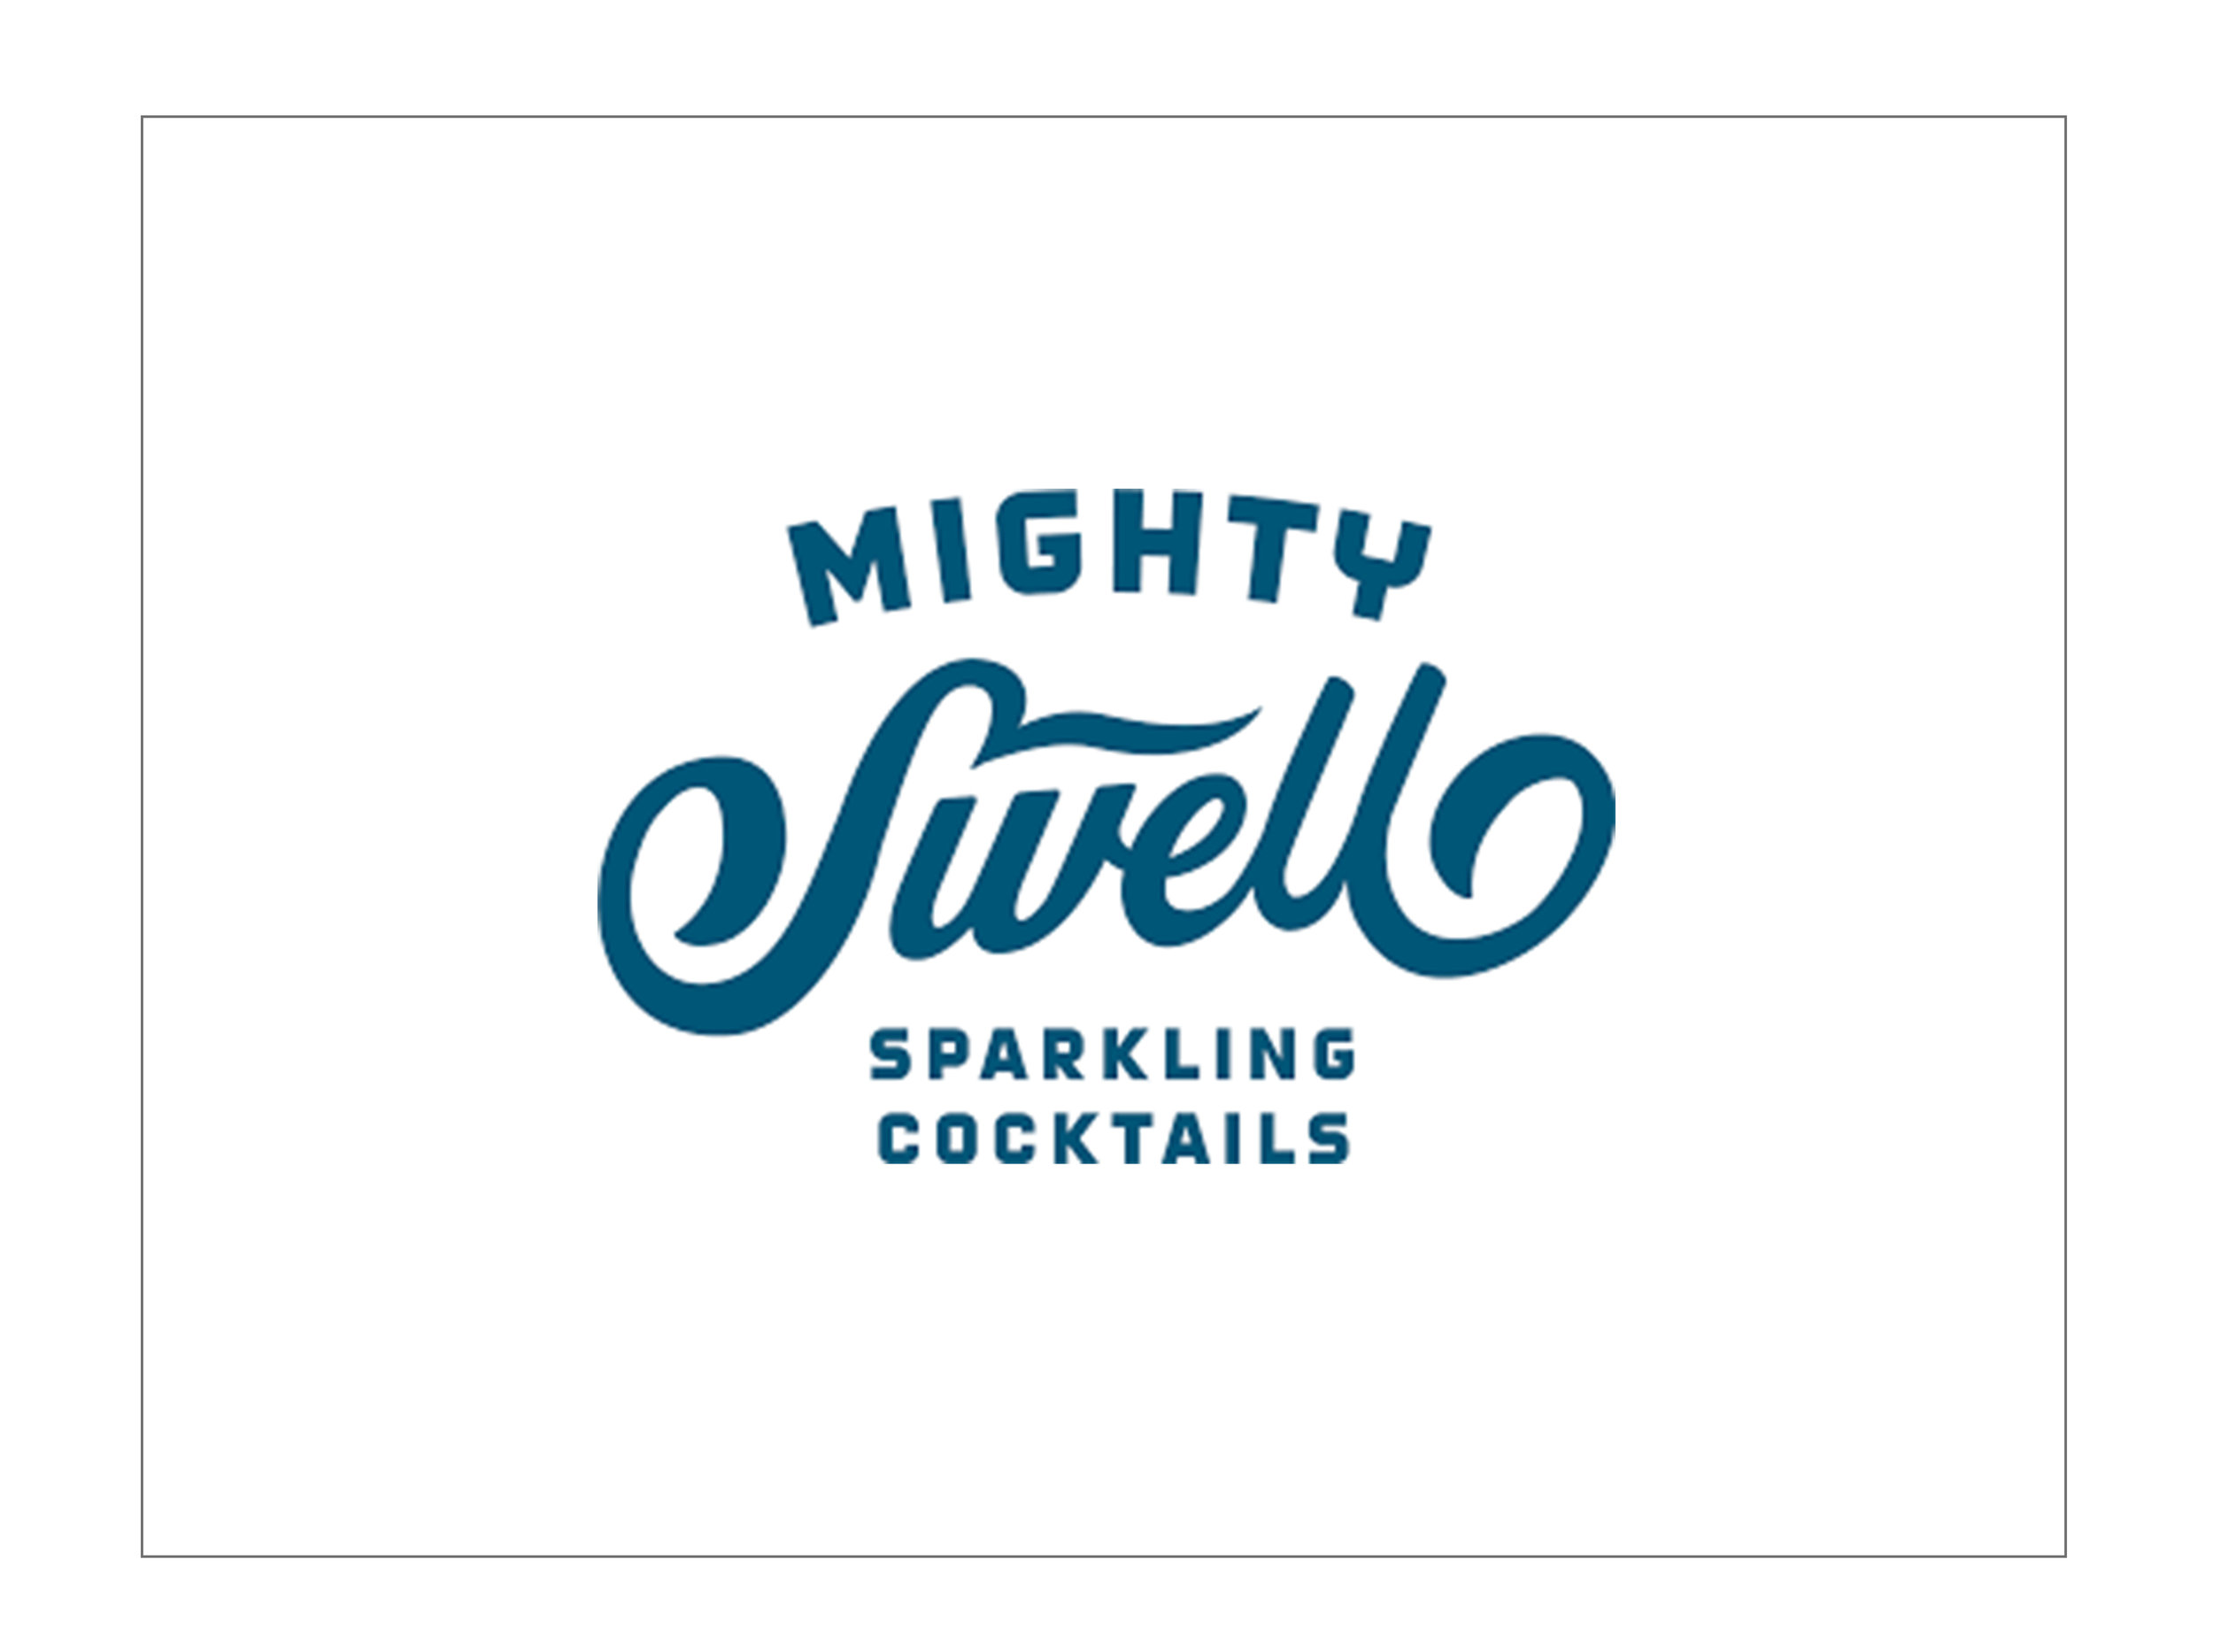 mighty_swell.jpg